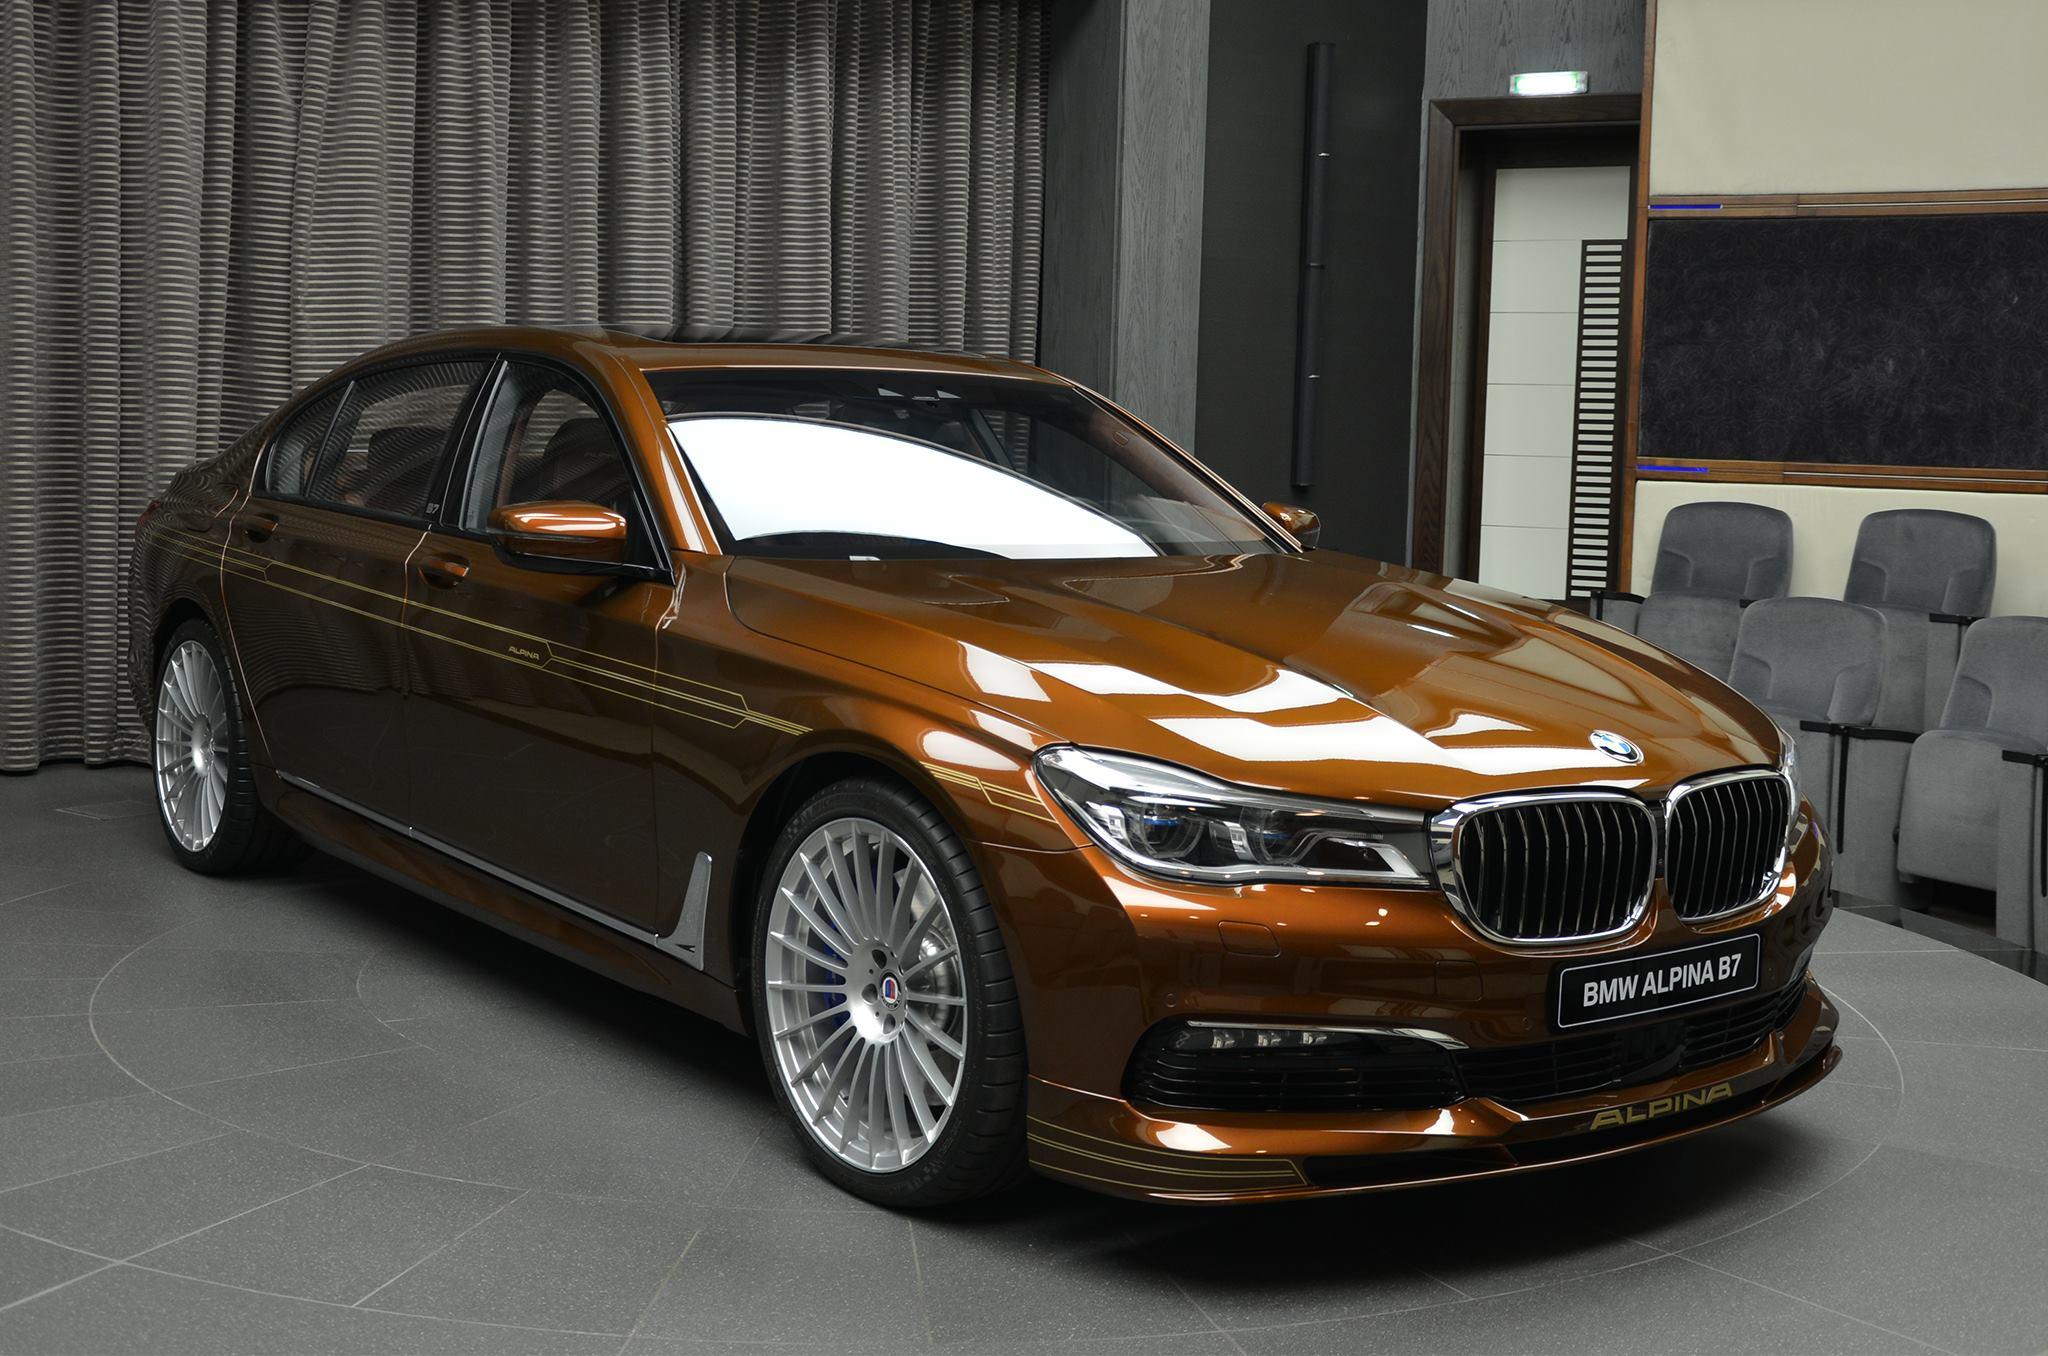 chestnut bronze alpina b7 bi turbo has matching brown interior autoevolution. Black Bedroom Furniture Sets. Home Design Ideas